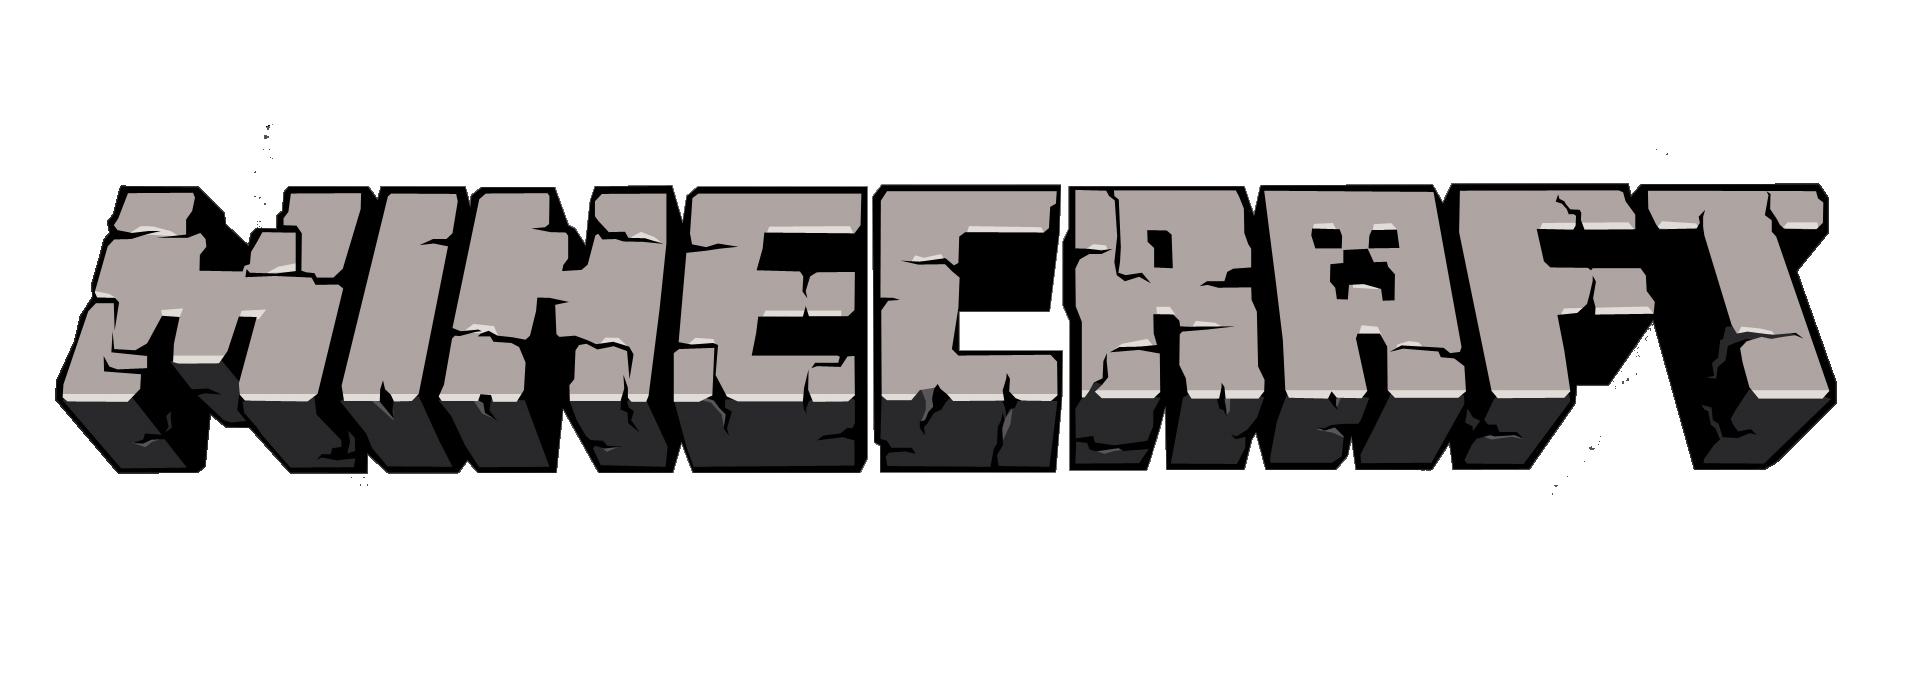 Клиент MineCraft 1.4.2 с шейдерами